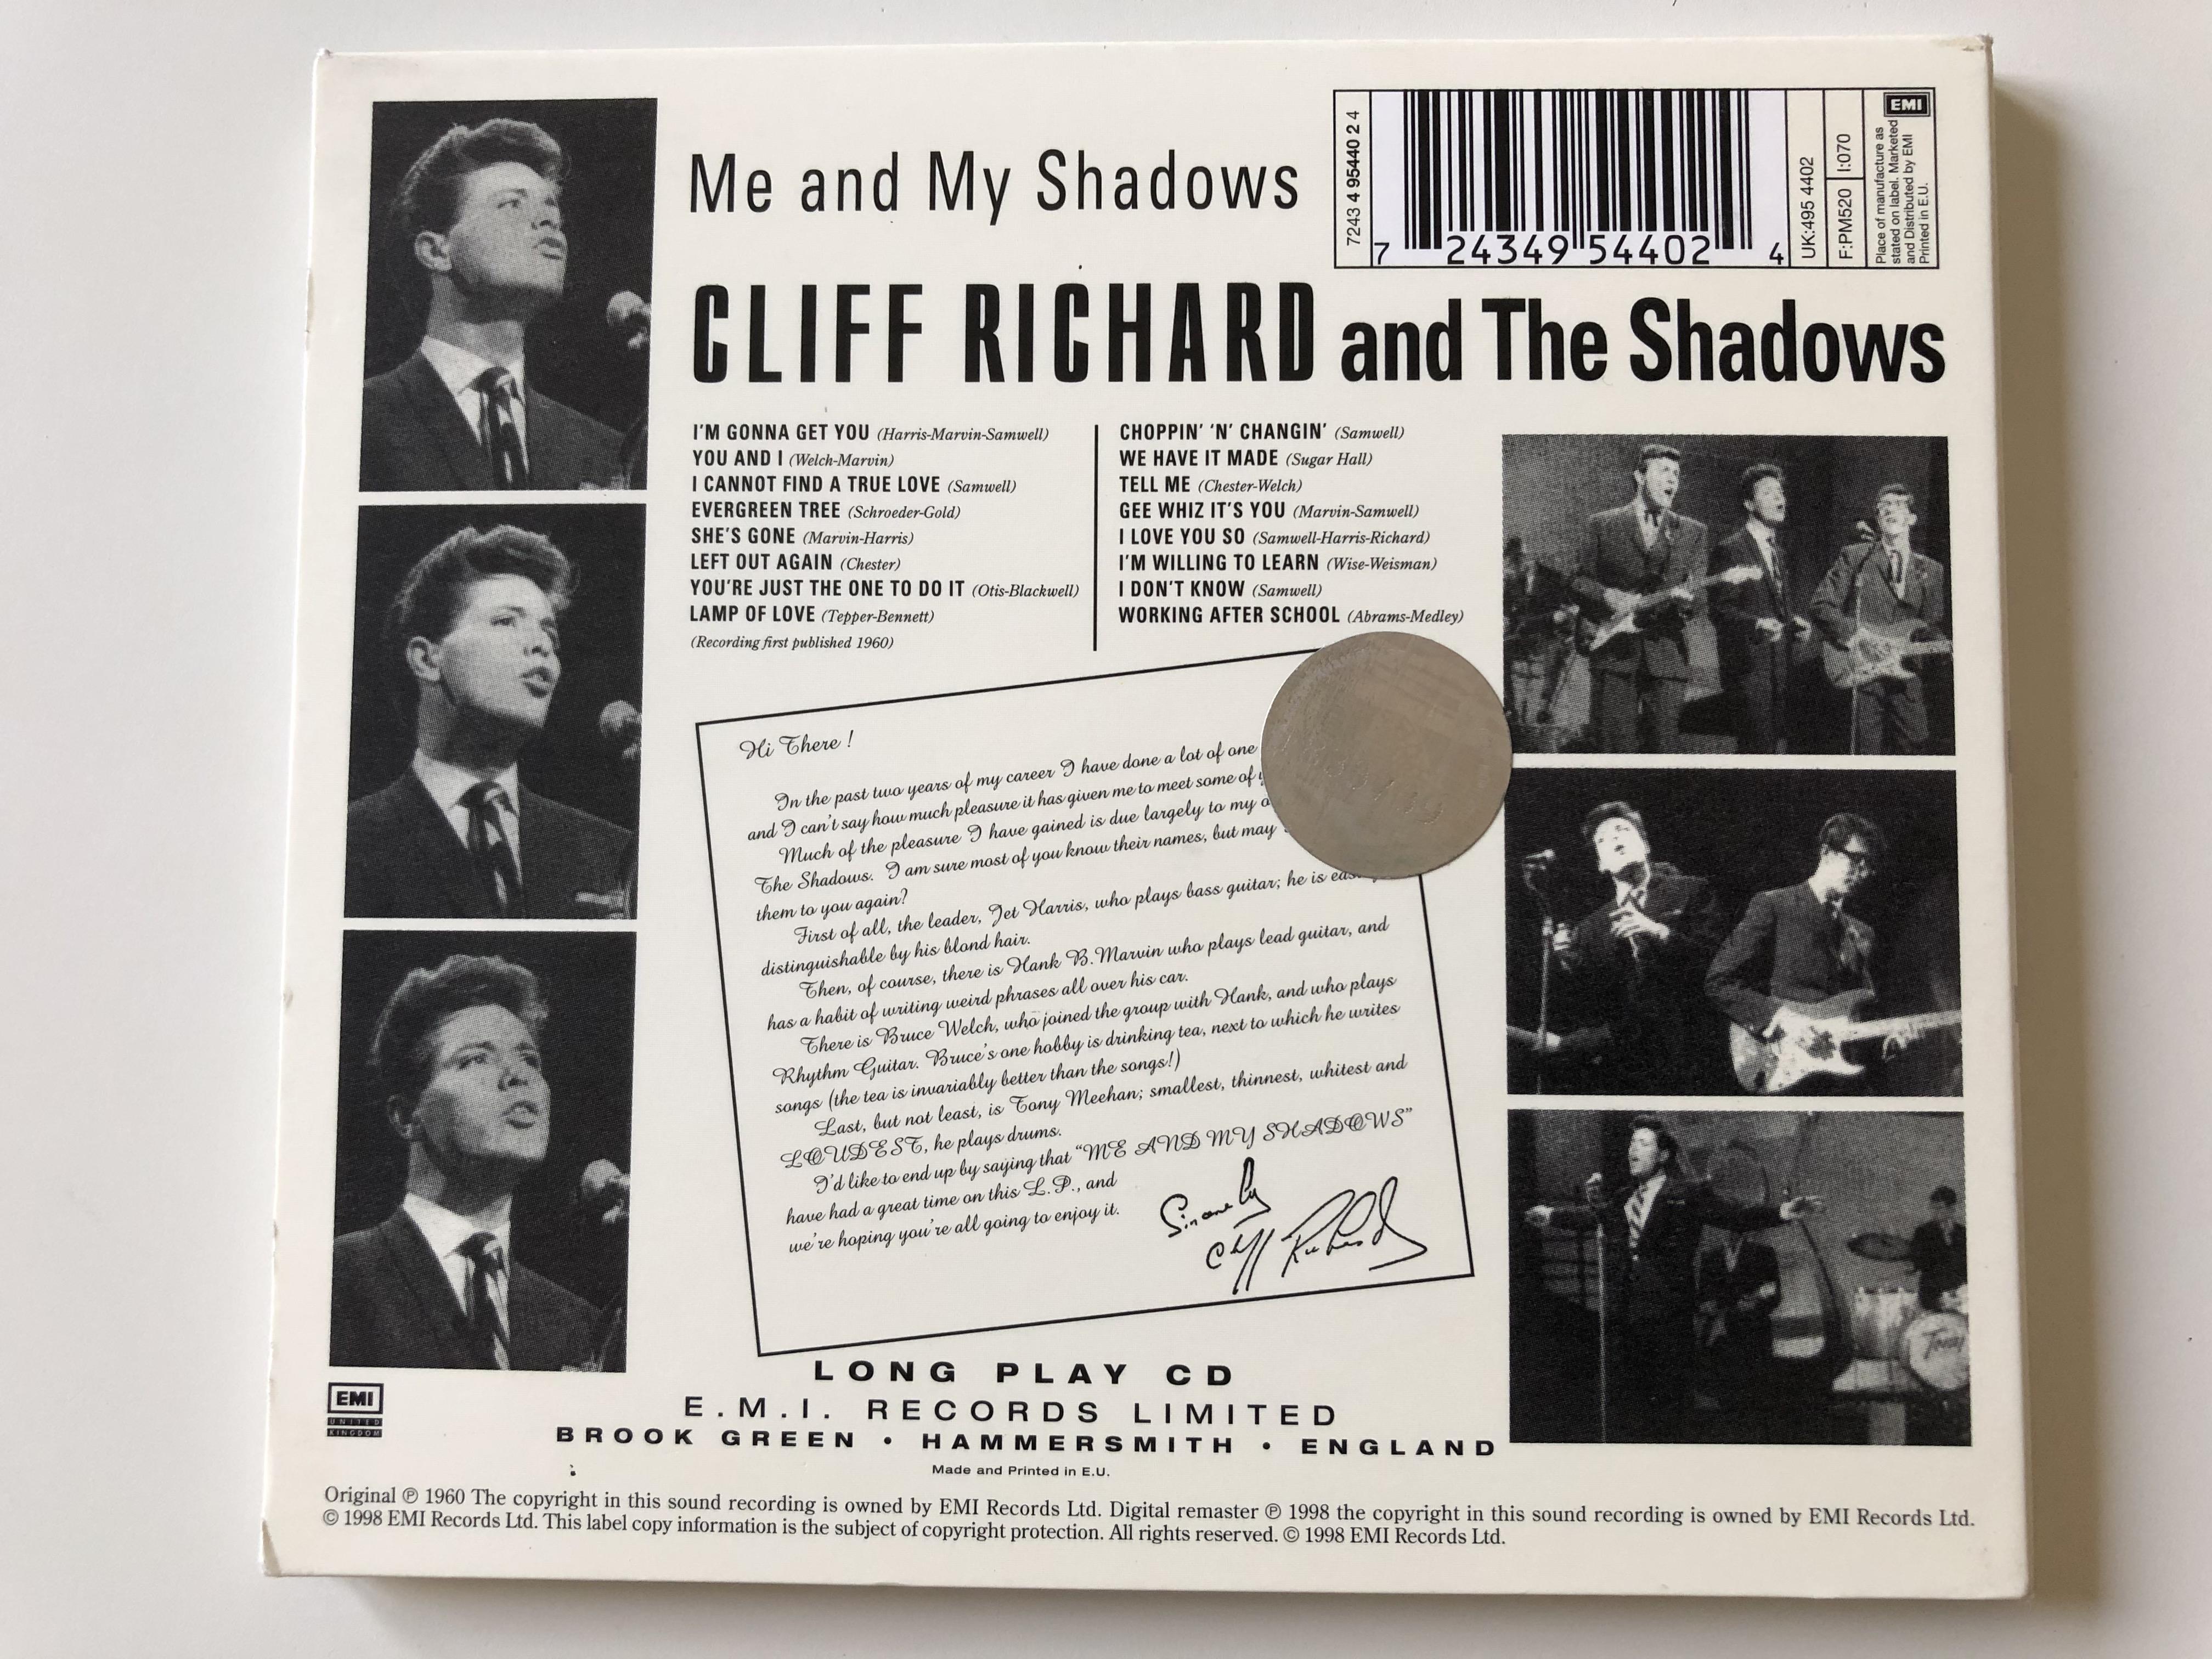 cliff-richard-and-the-shadows-me-and-my-shadows-emi-audio-cd-1998-mono-stereo-724349544024-4-.jpg